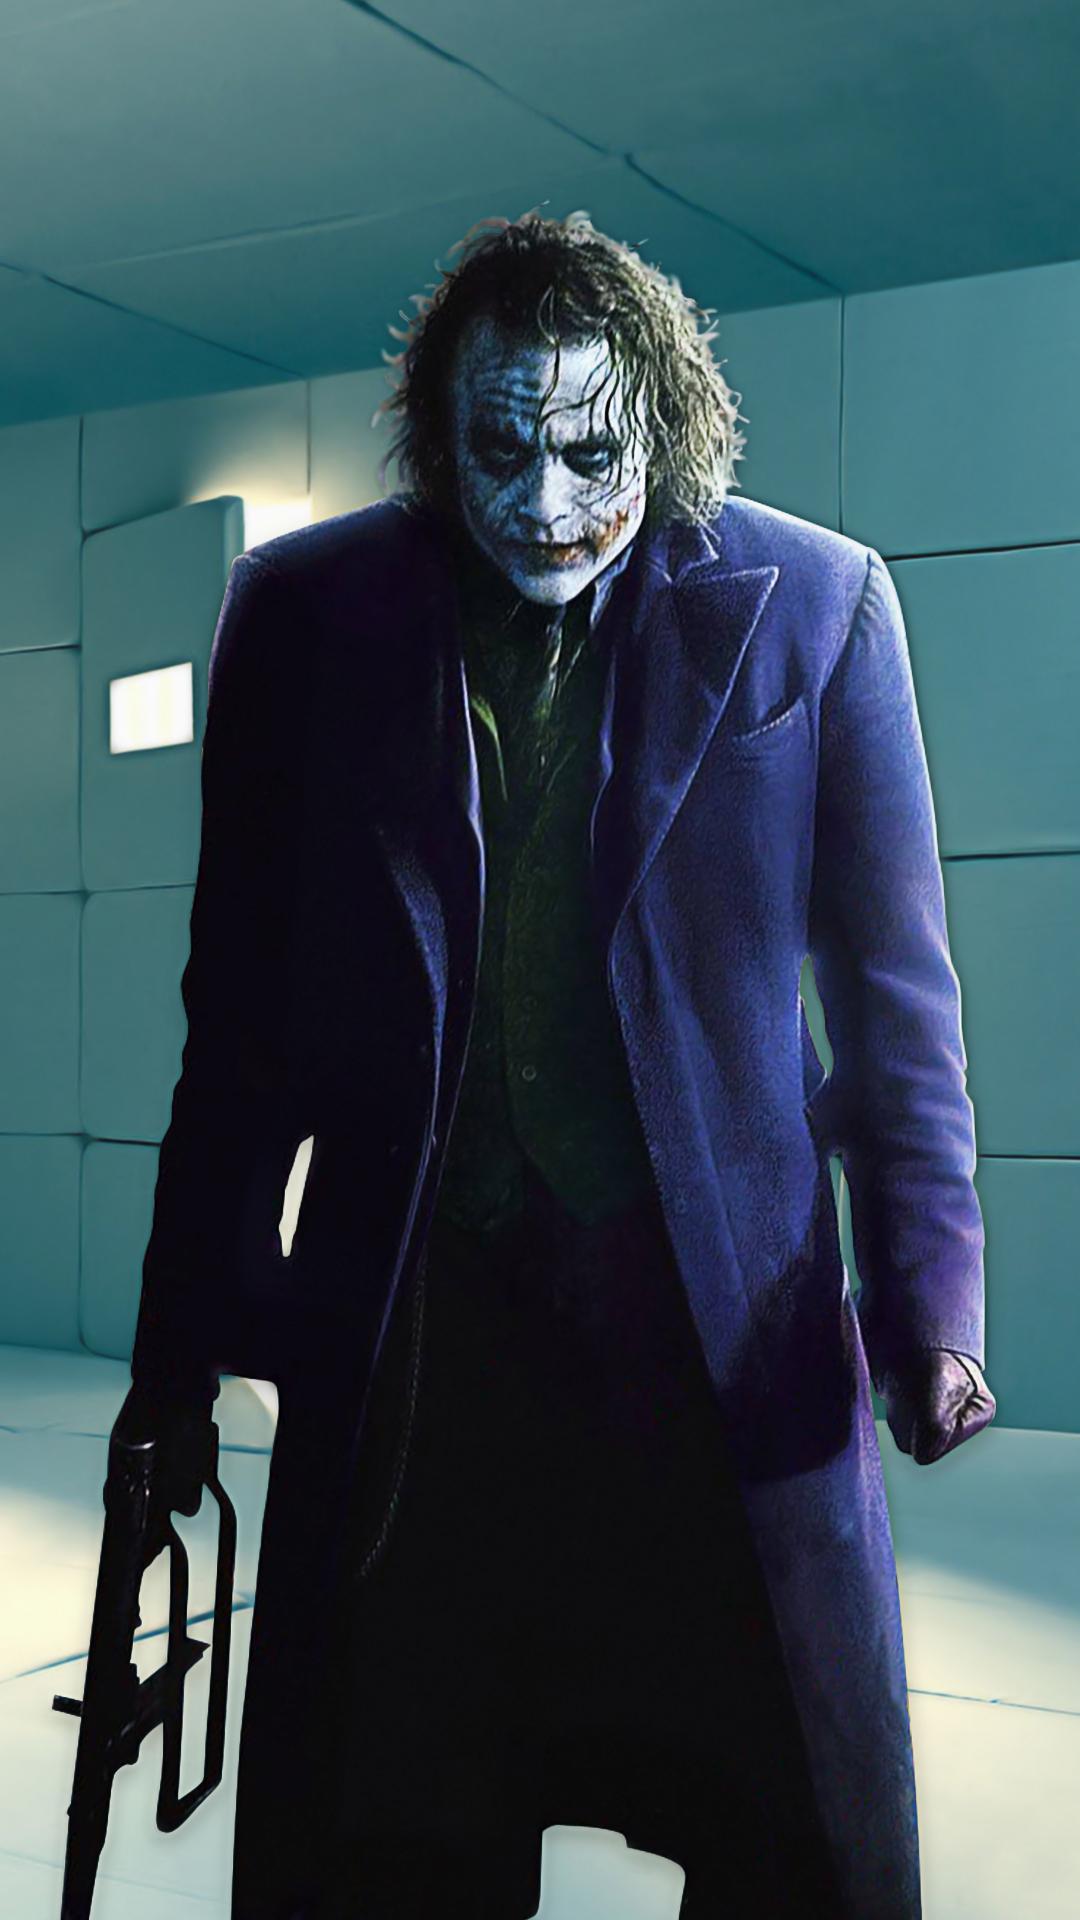 The Joker iPhone Background 1080x1920